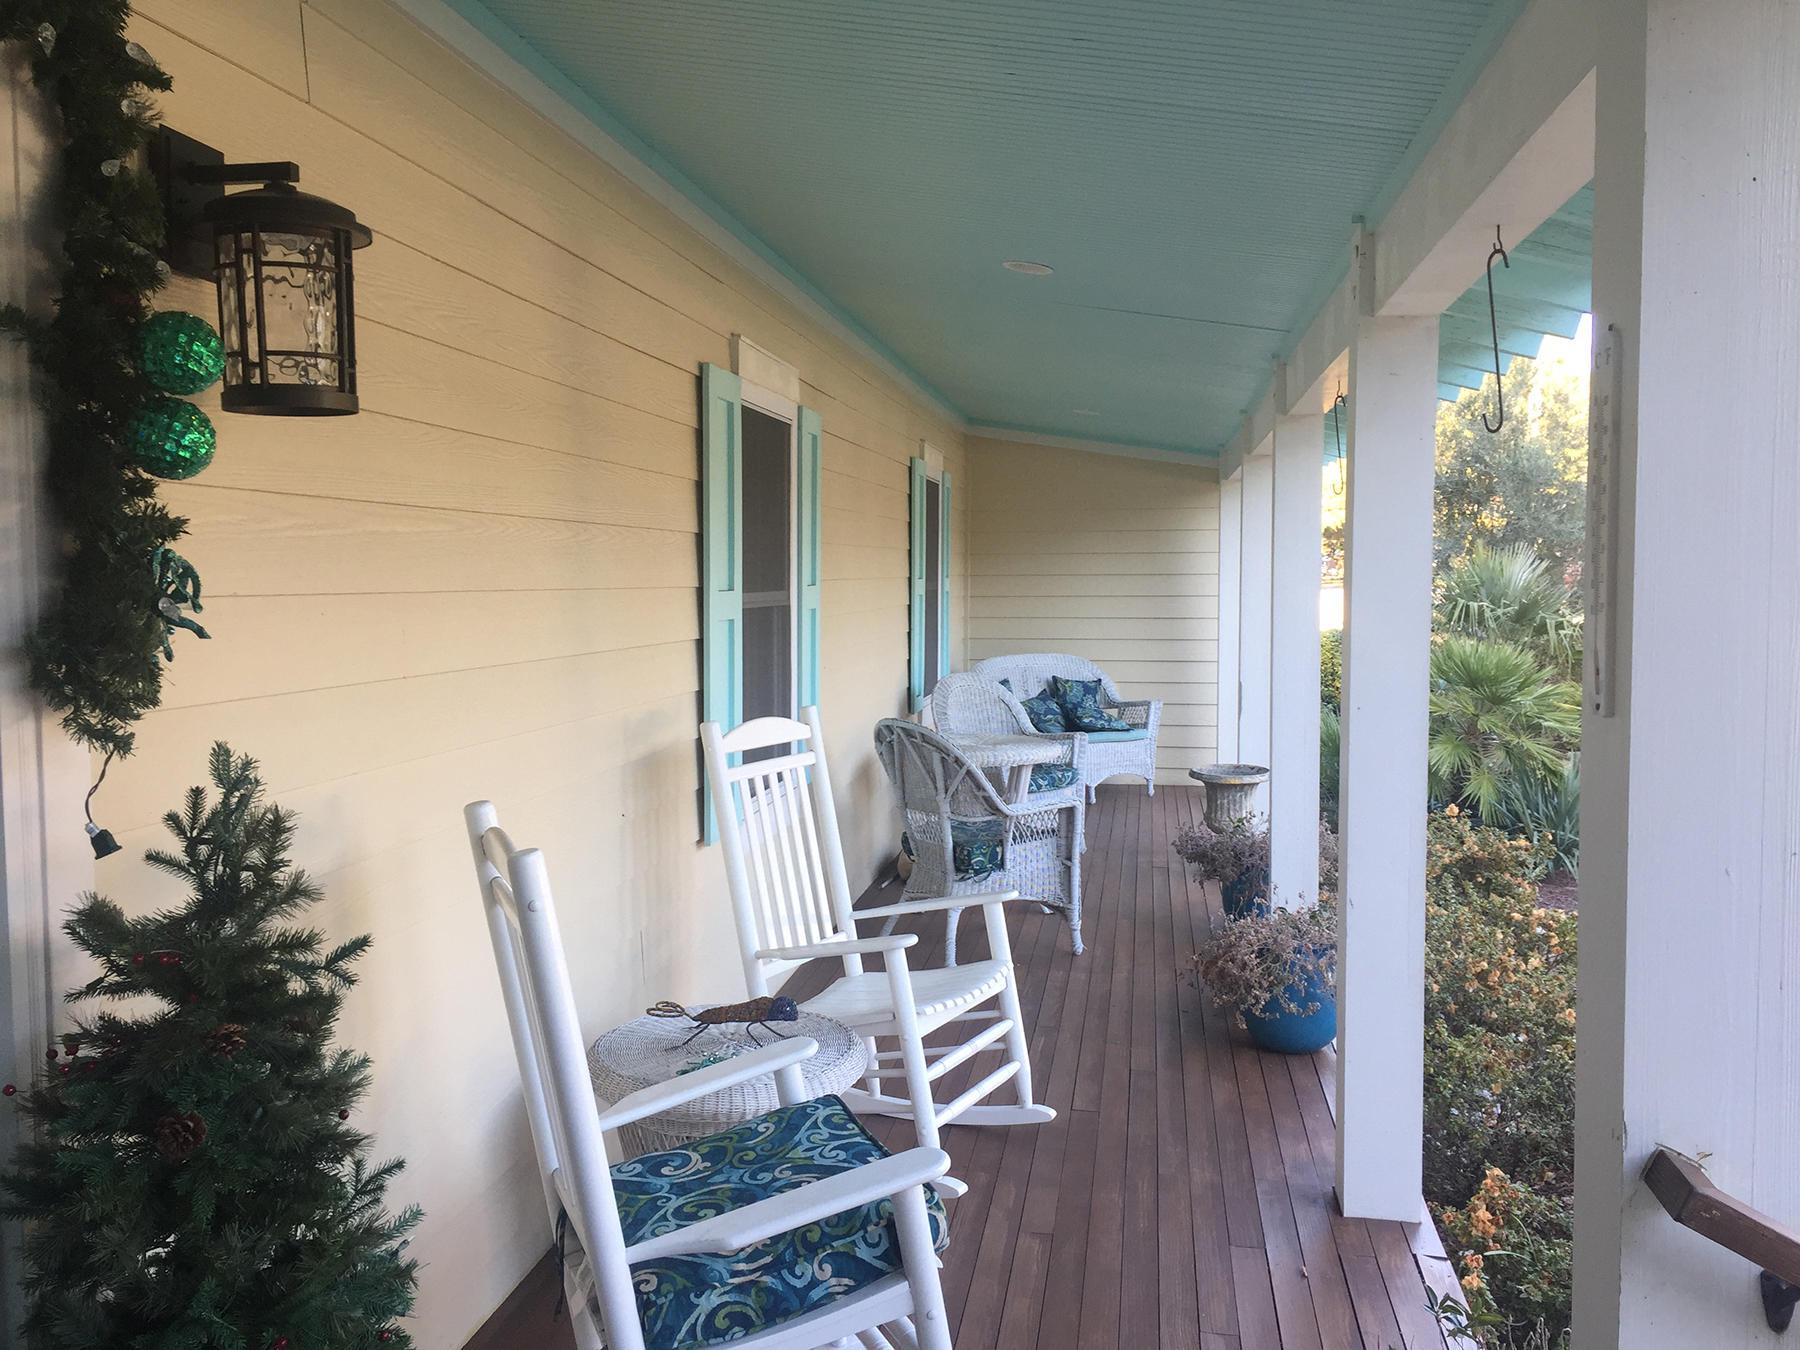 Old Mt Pleasant Homes For Sale - 638 Adluh, Mount Pleasant, SC - 9